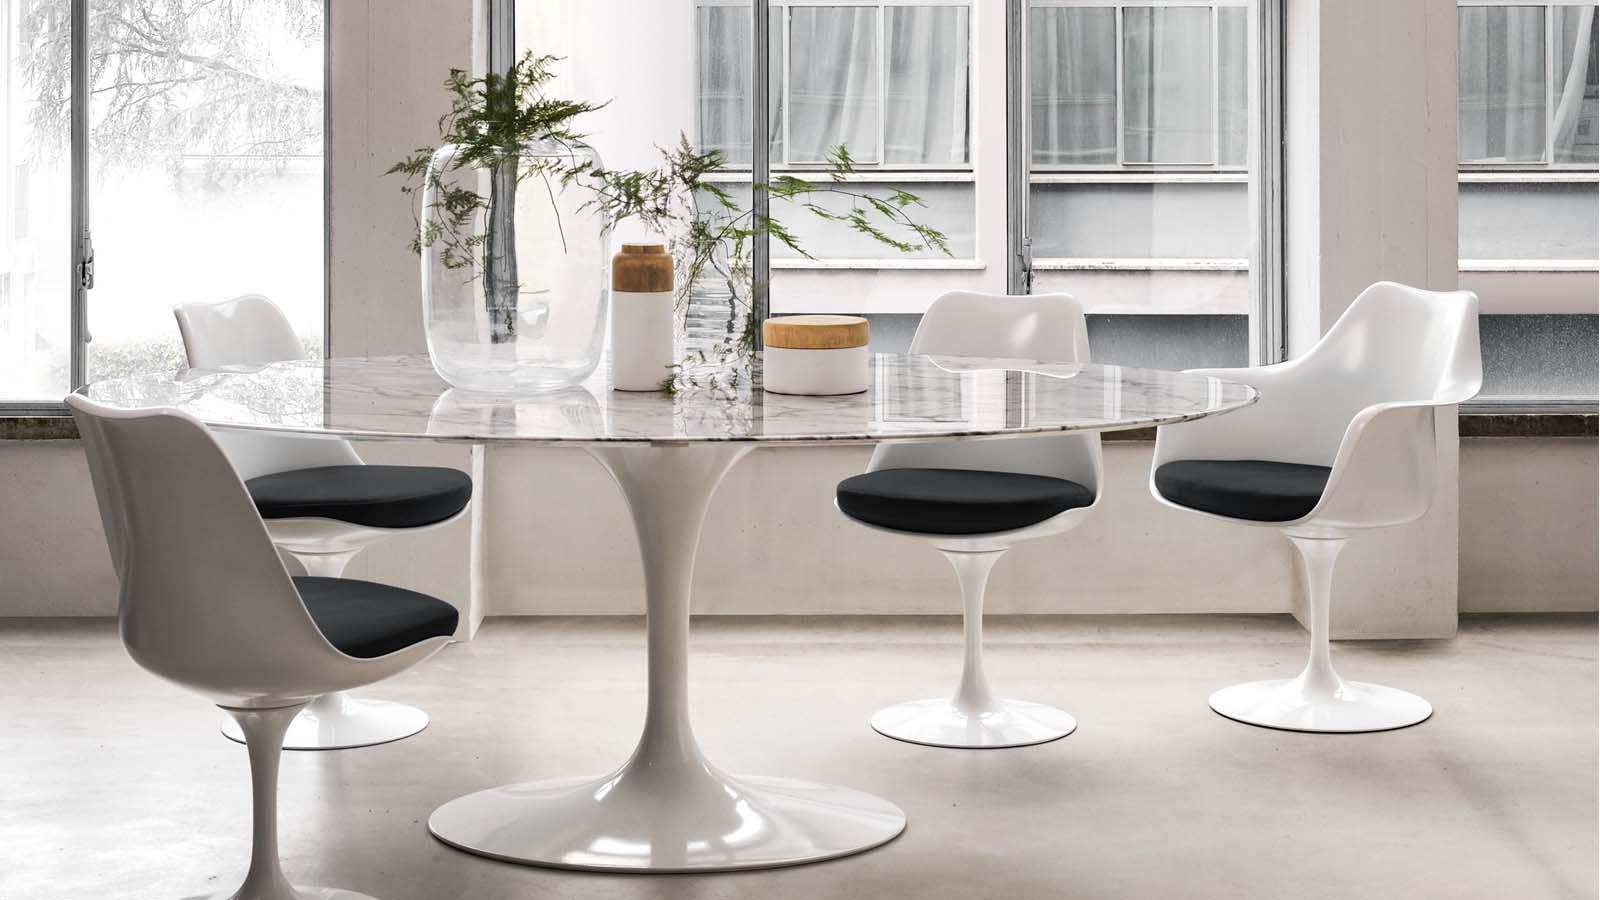 Tavoli Da Cucina Design.18 Tavoli Da Pranzo Dal Design Moderno